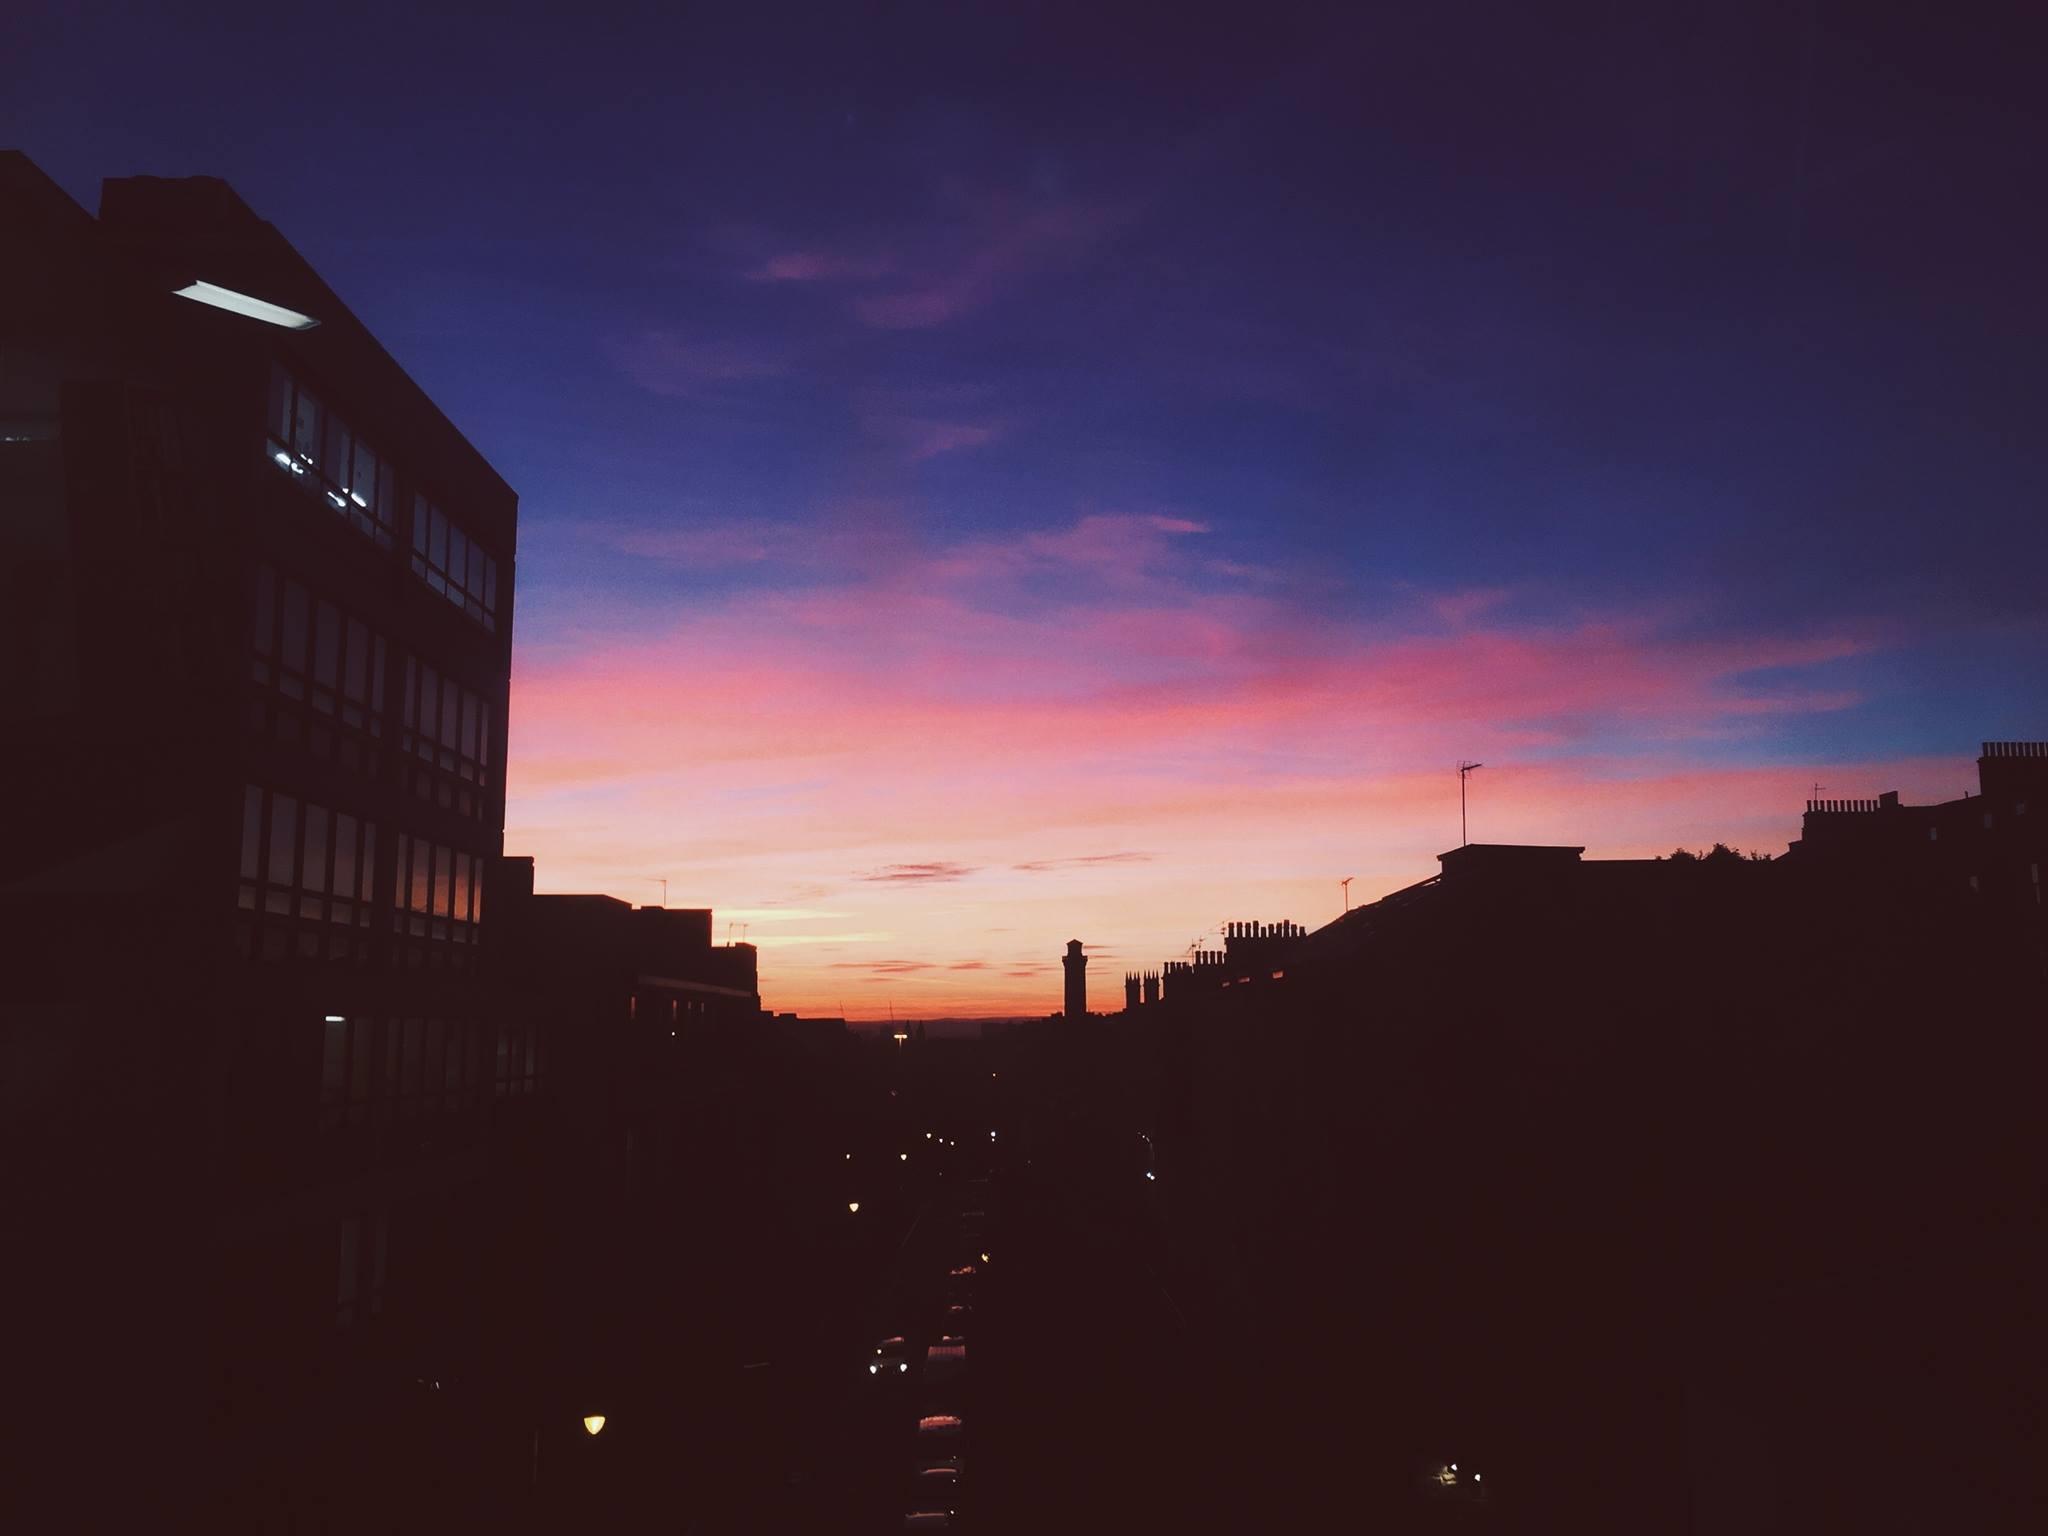 picturelife_photo_-5.JPEG